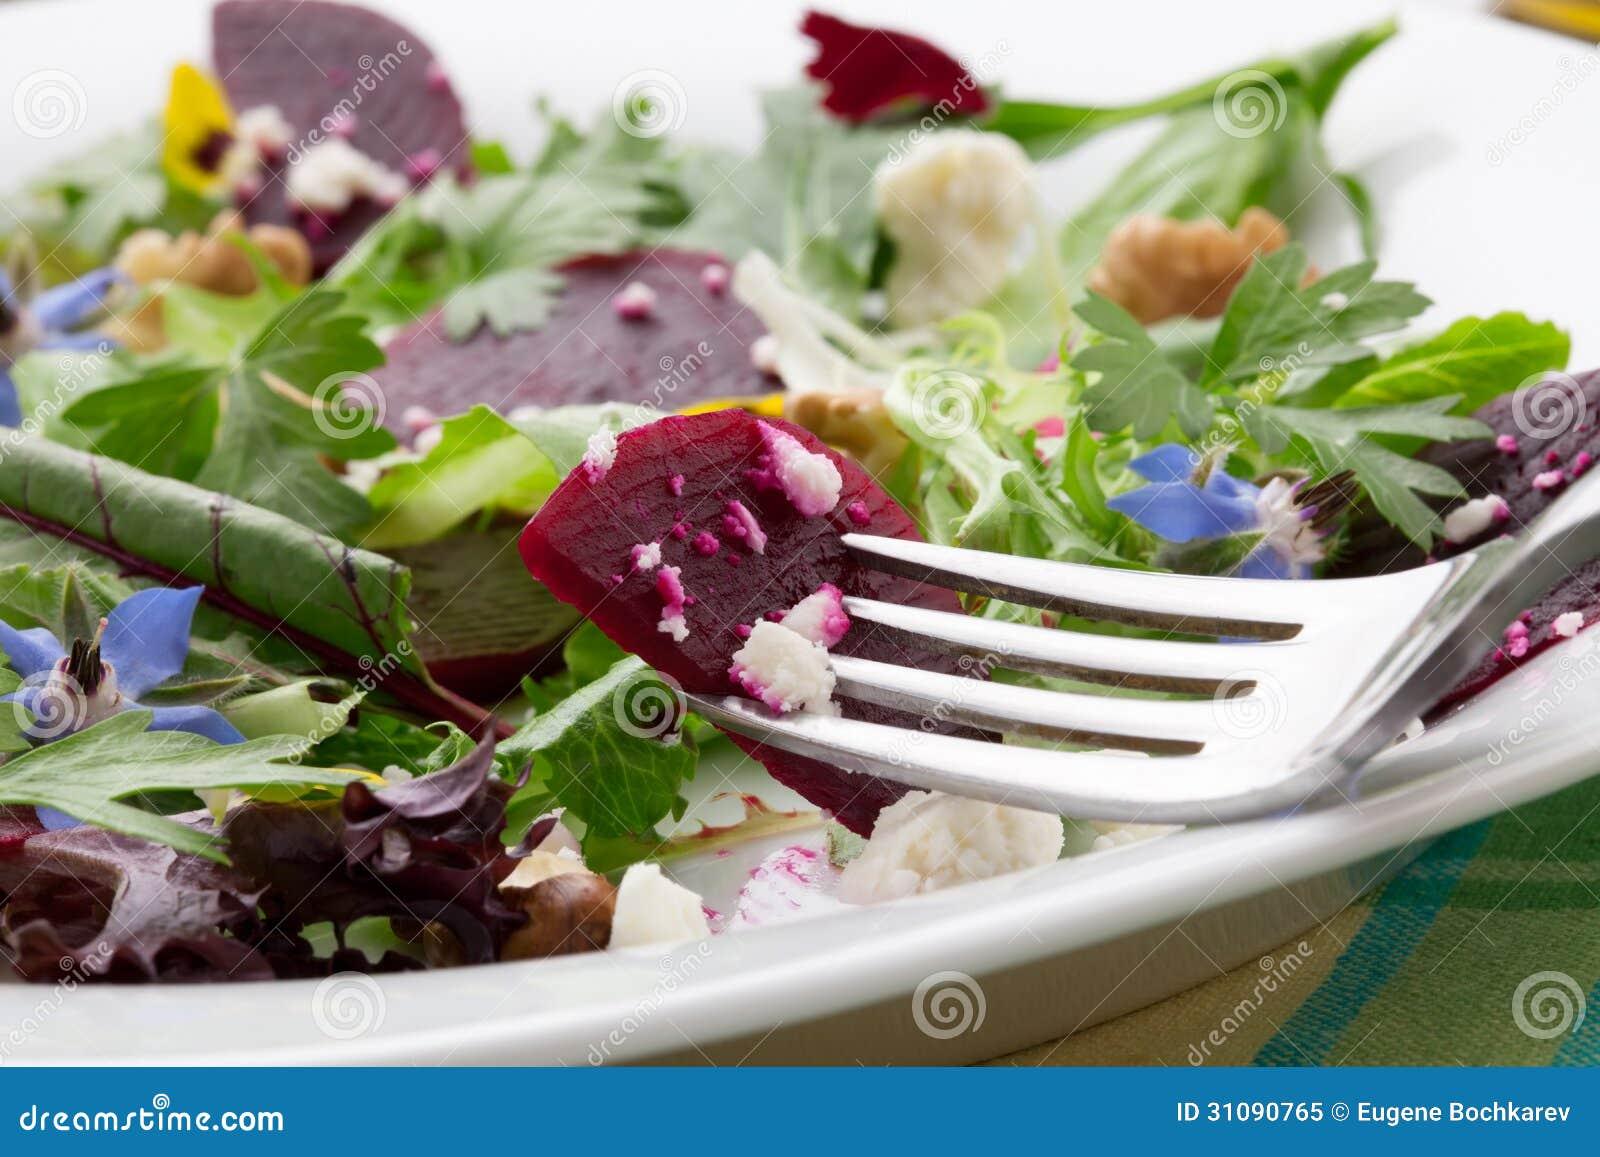 Beets And Baby Greens Salad Royalty Free Stock Photo - Image: 31090765